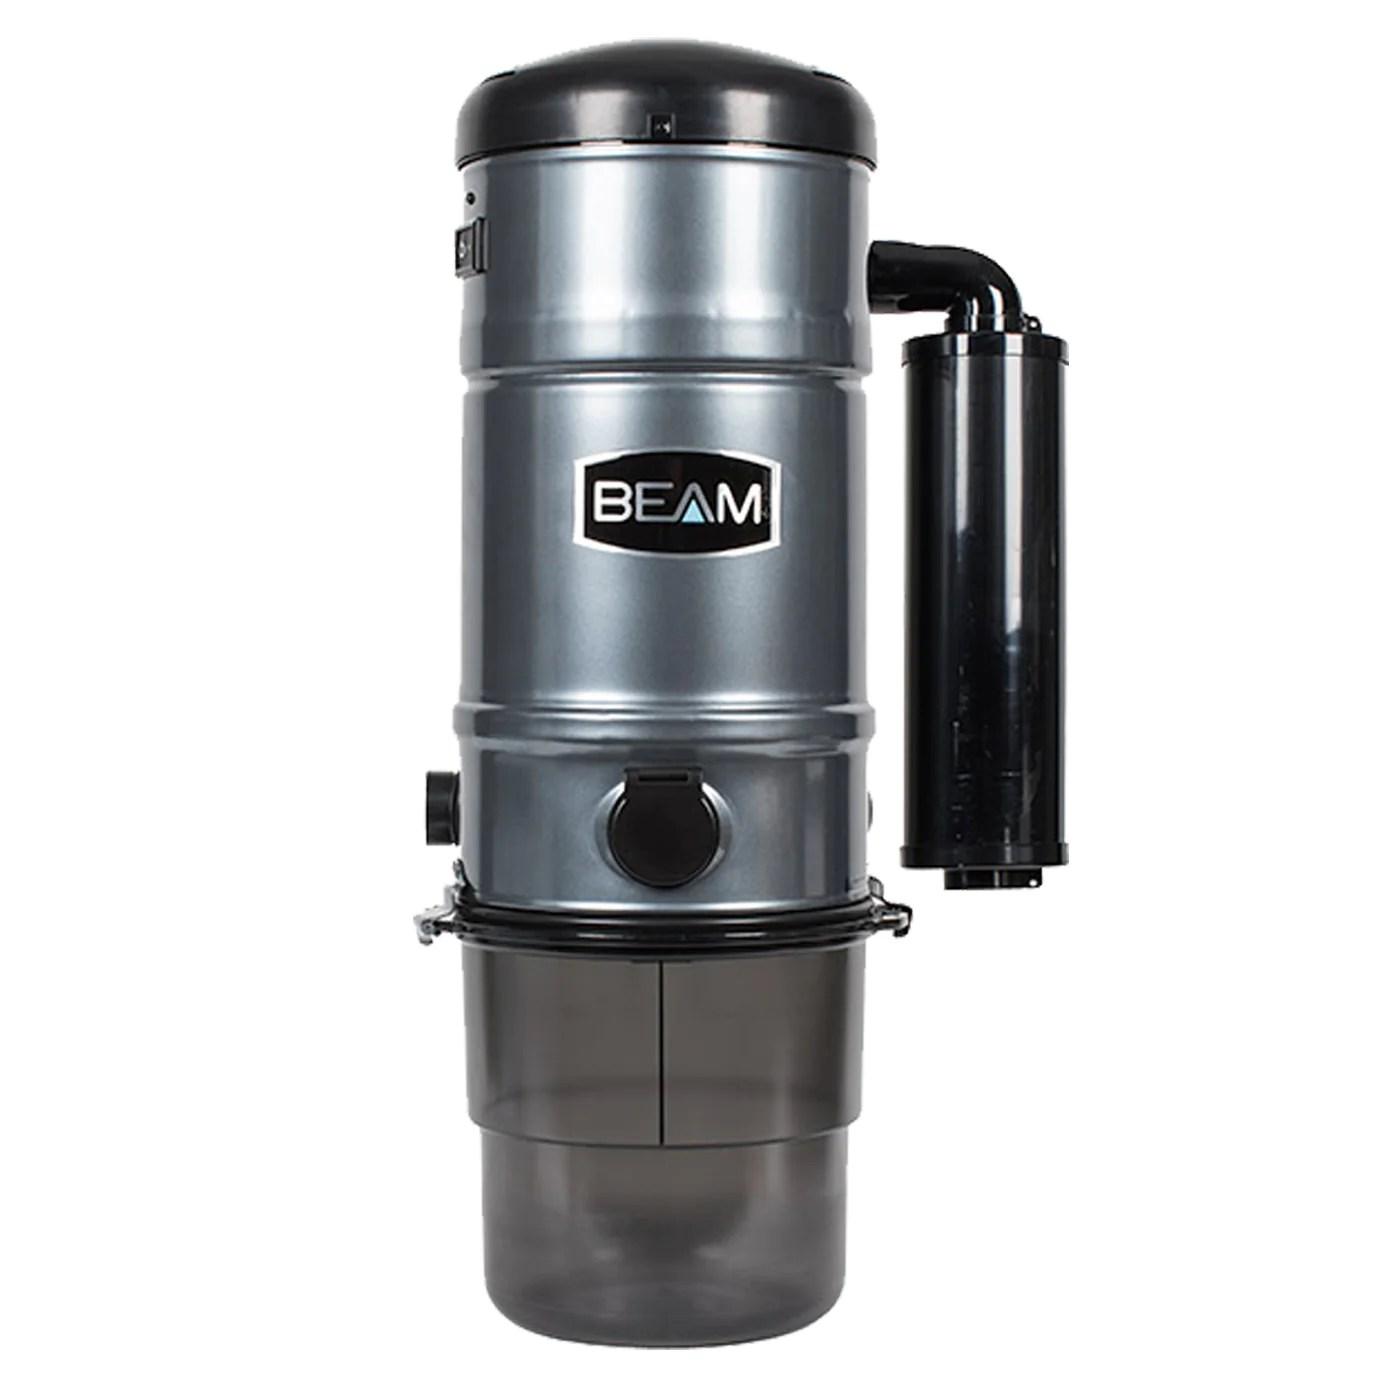 medium resolution of beam serenity 325d central vacuum canister